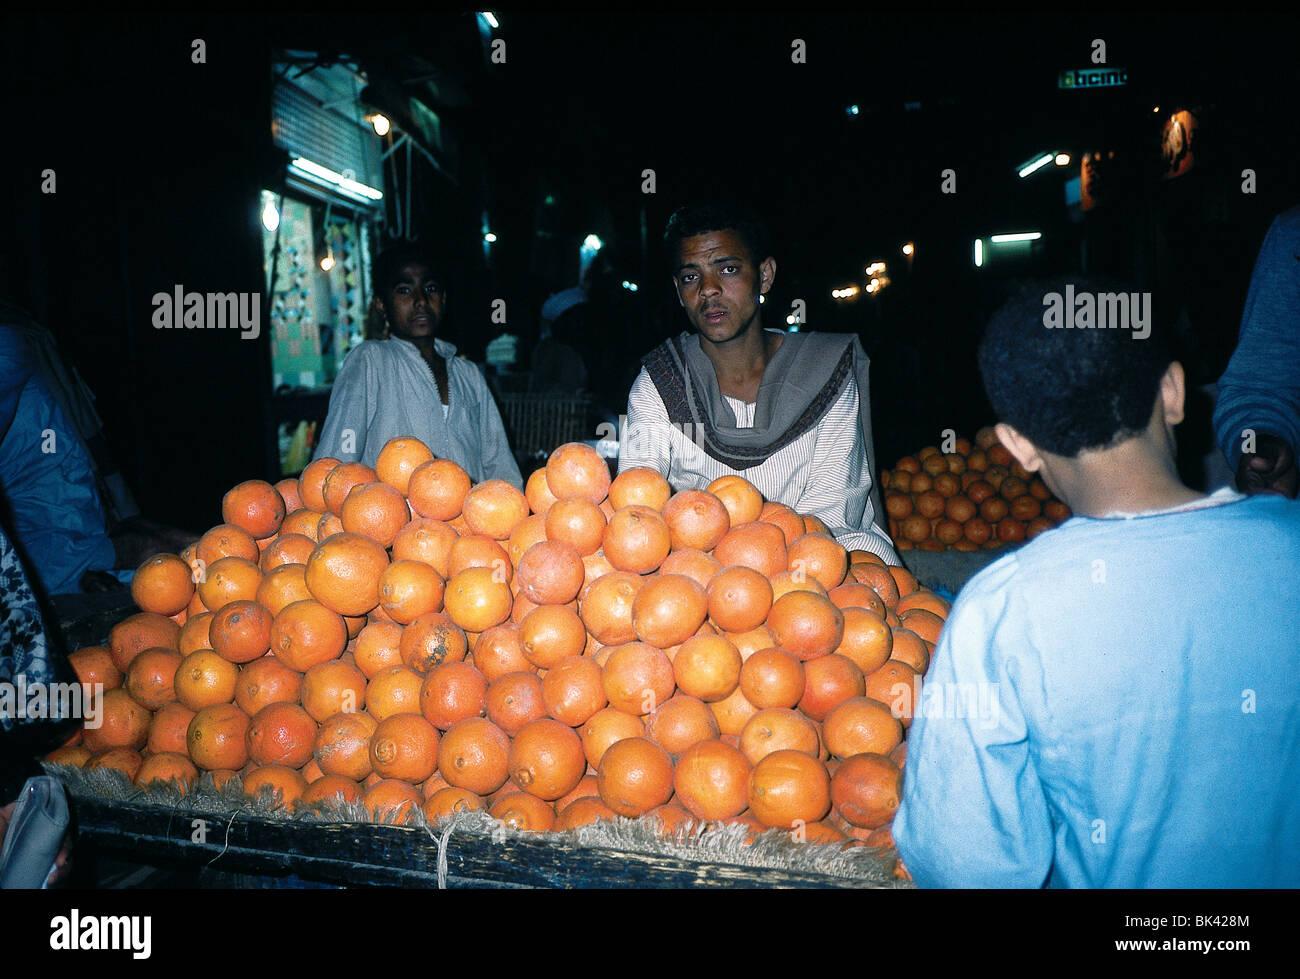 Merchant selling oranges, Egypt - Stock Image